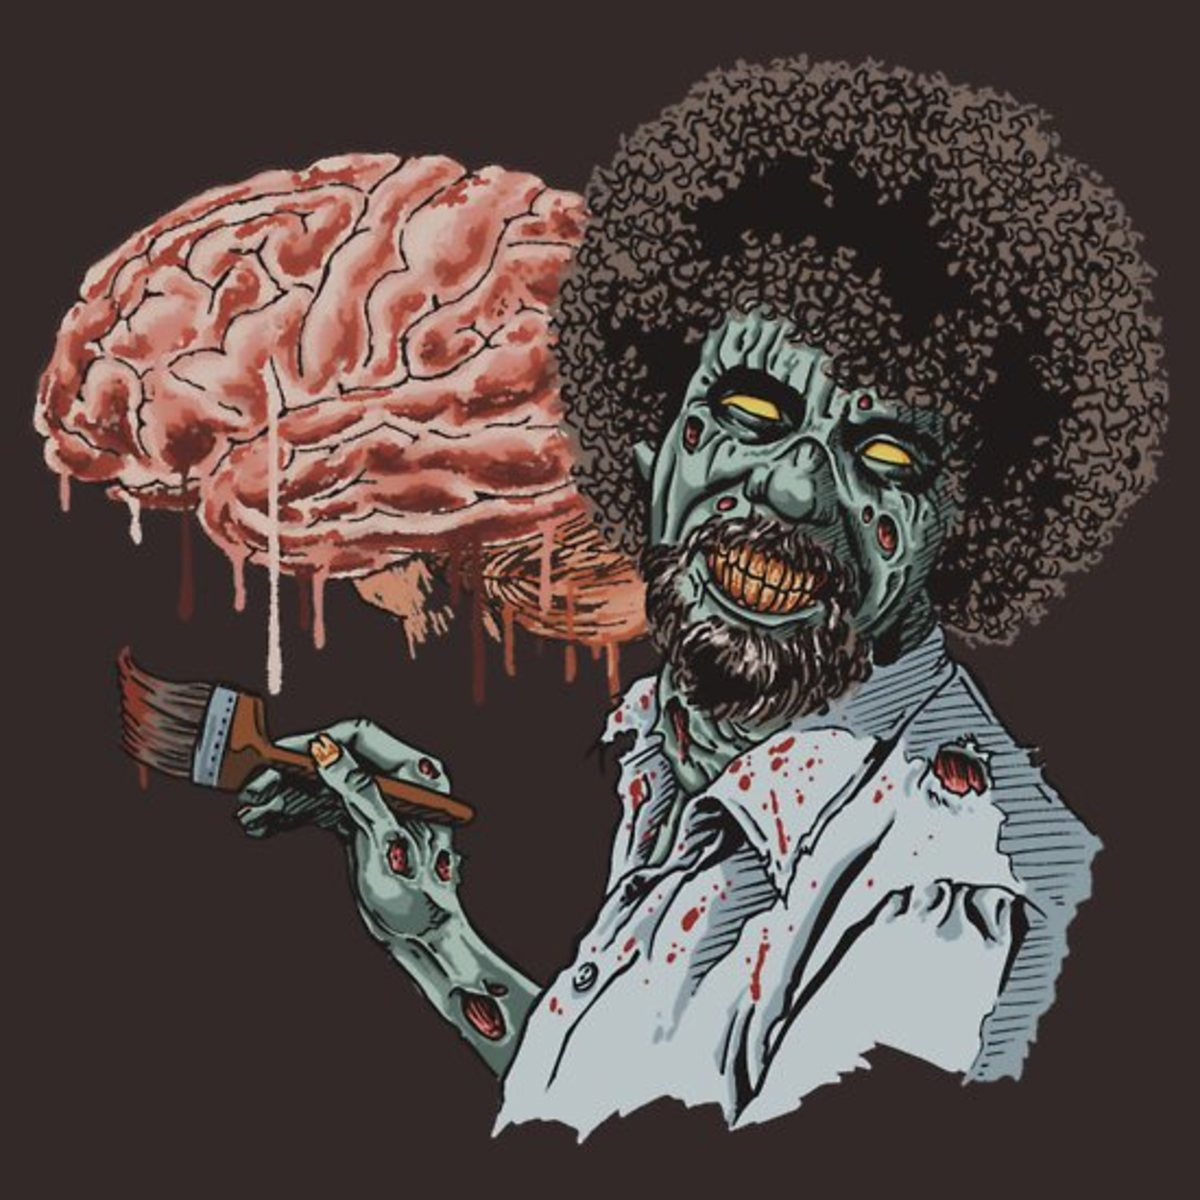 Zombie Bob Ross